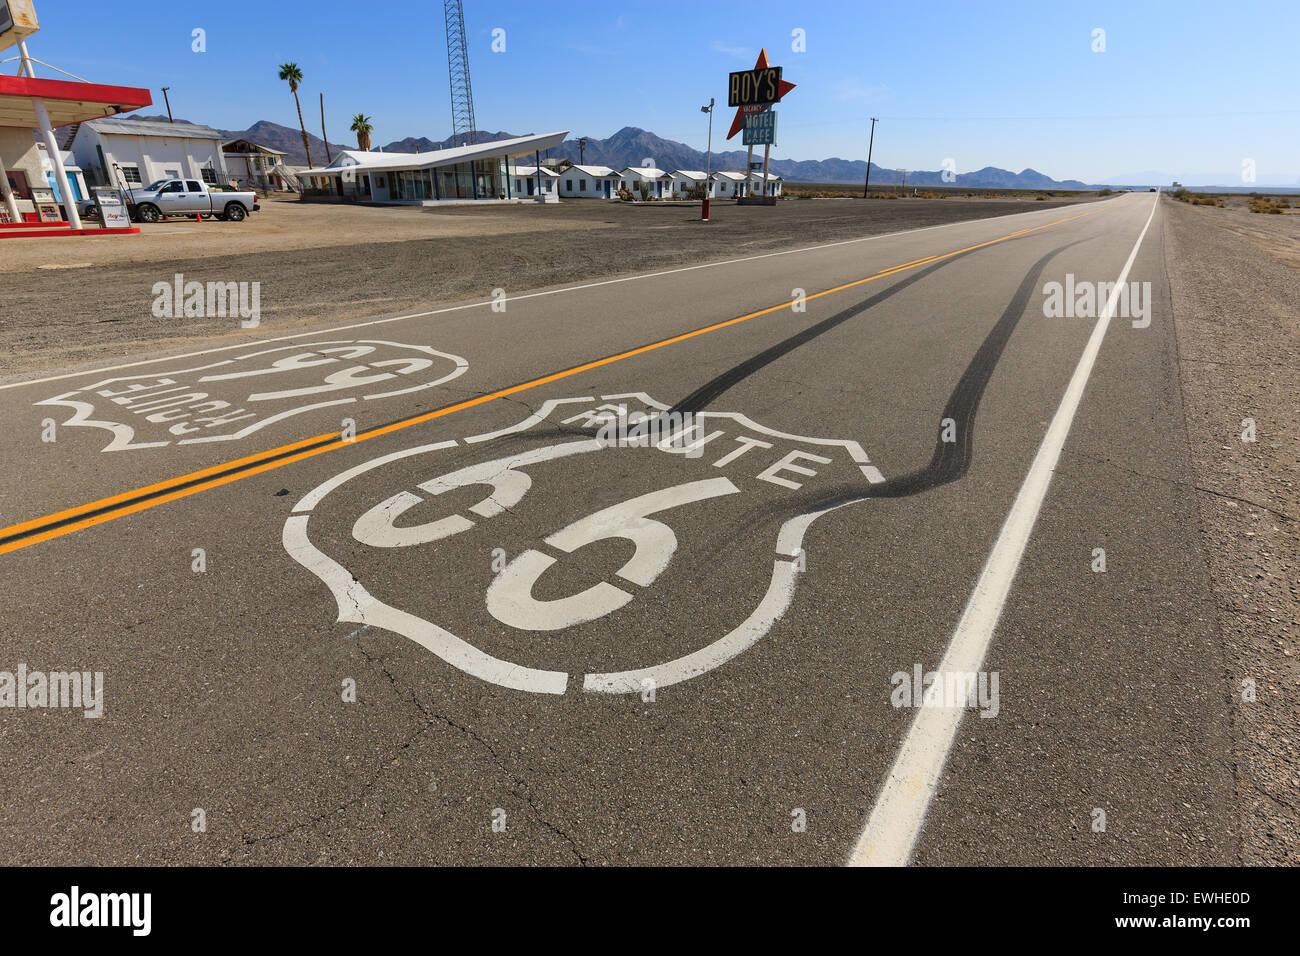 Amboy on Route 66, California, USA. - Stock Image